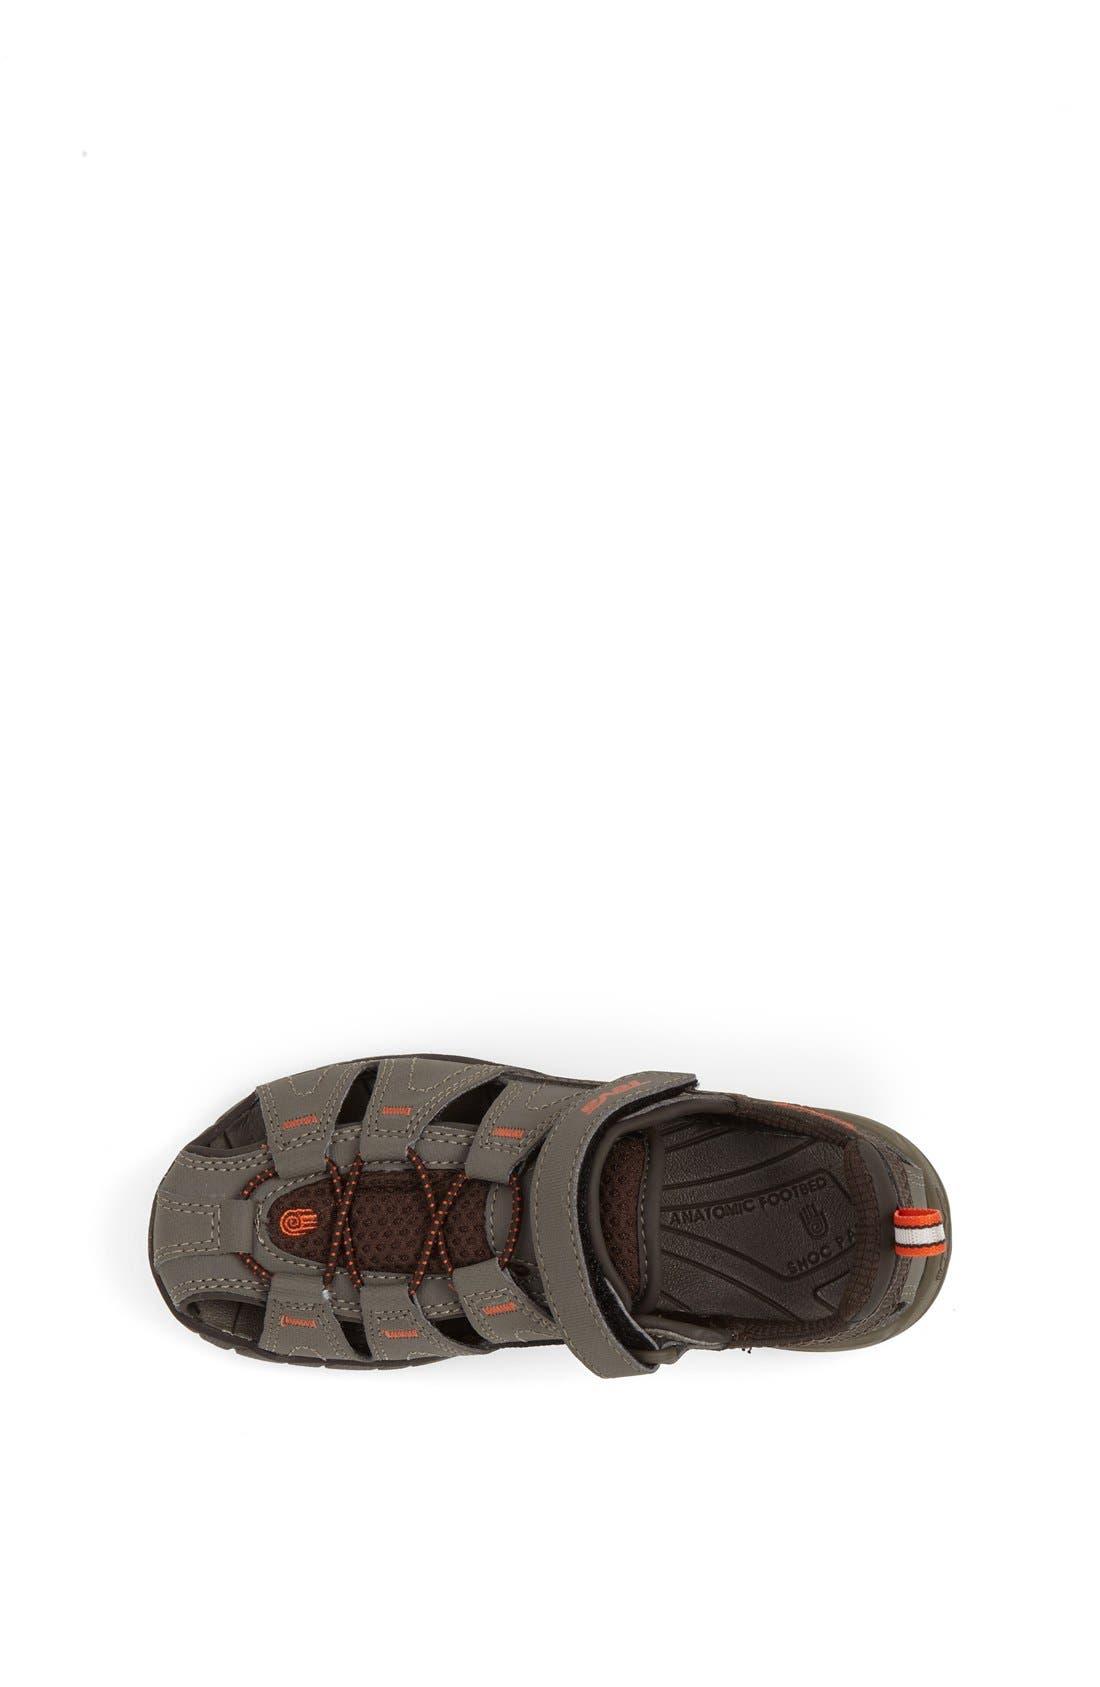 Alternate Image 3  - Teva 'Dozer 3' Sandal (Toddler, Little Kid & Big Kid)